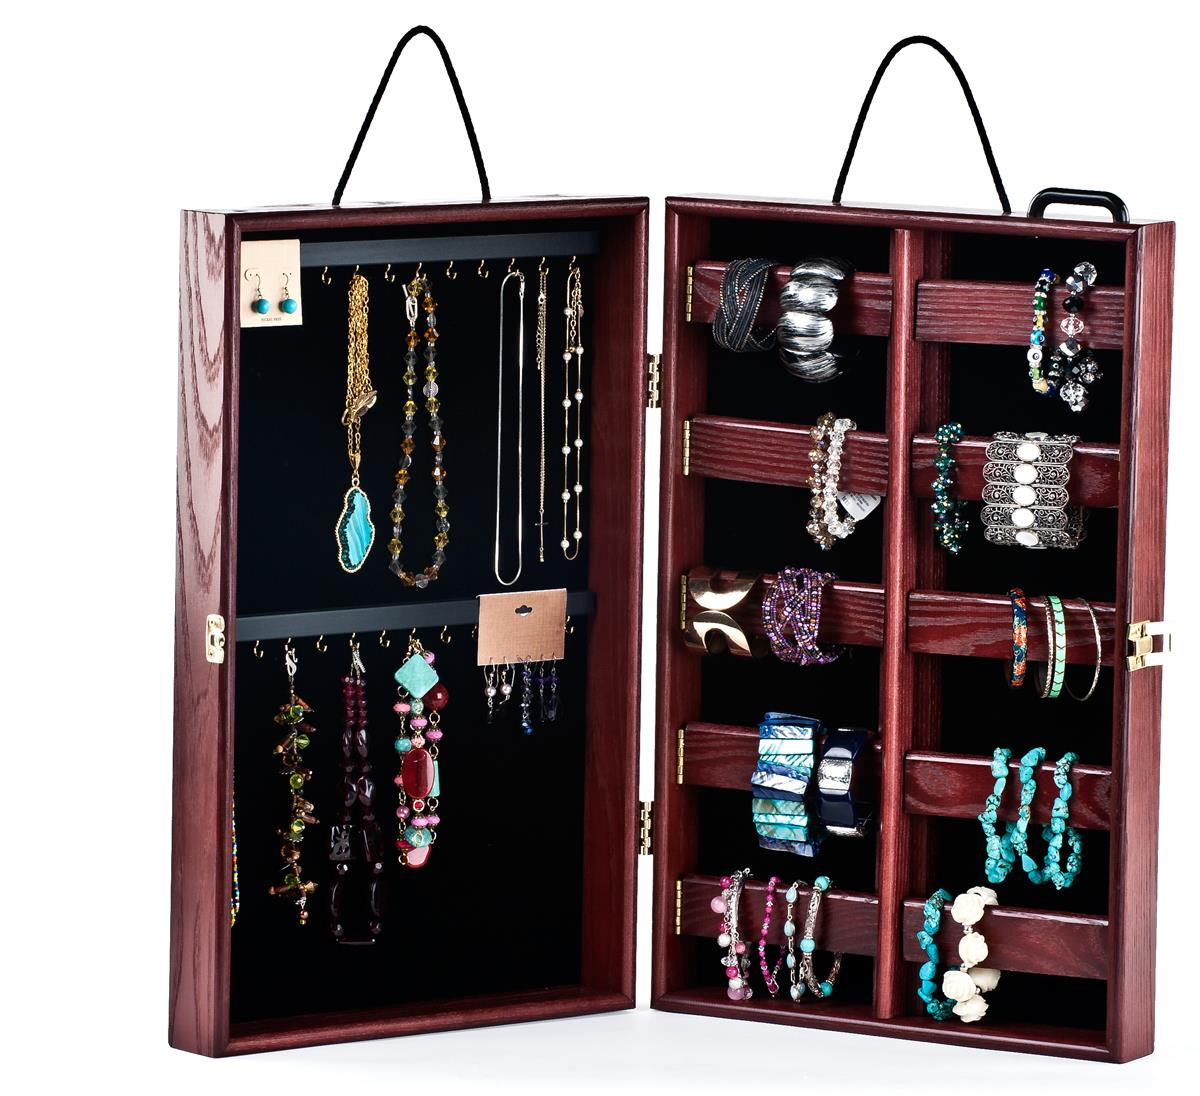 Portable Jewelry Showcase - Ash Wood w/ Cherry Finish